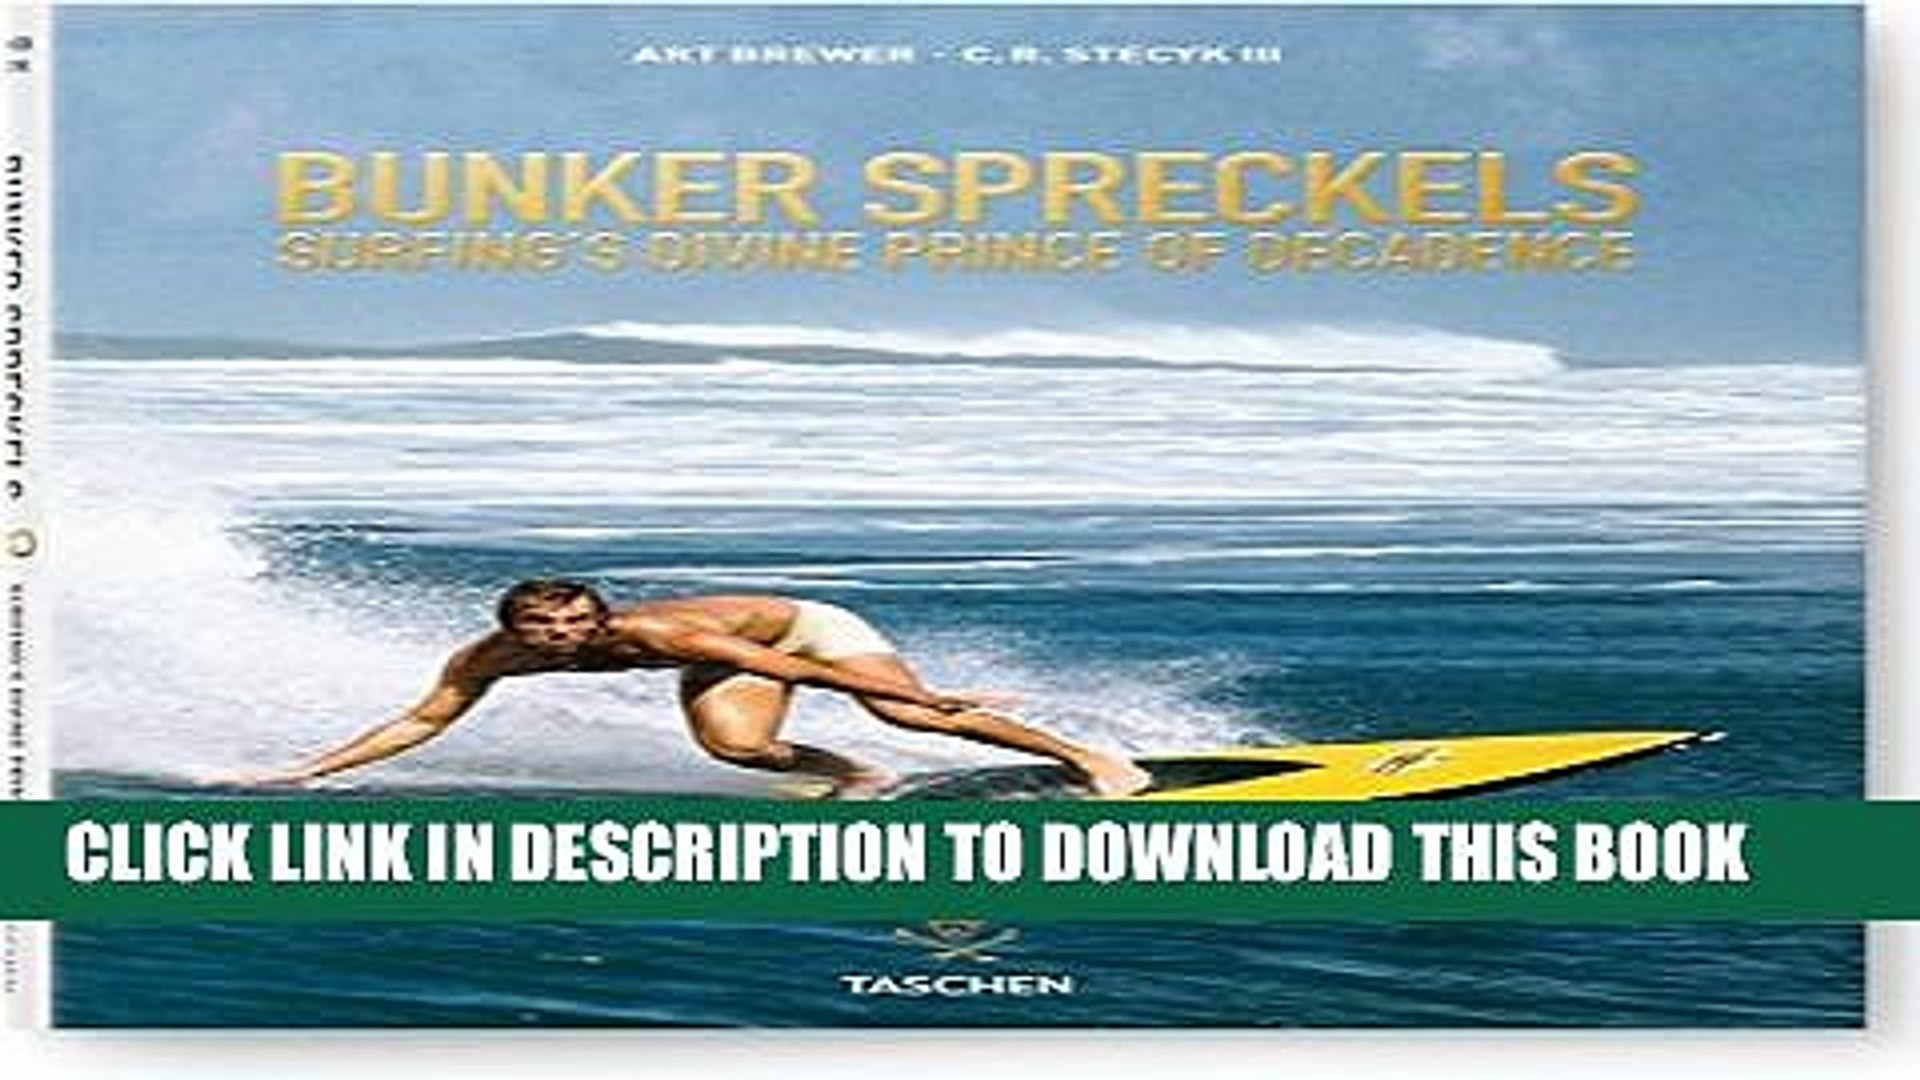 Surfings Divine Prince of Decadence Bunker Spreckels